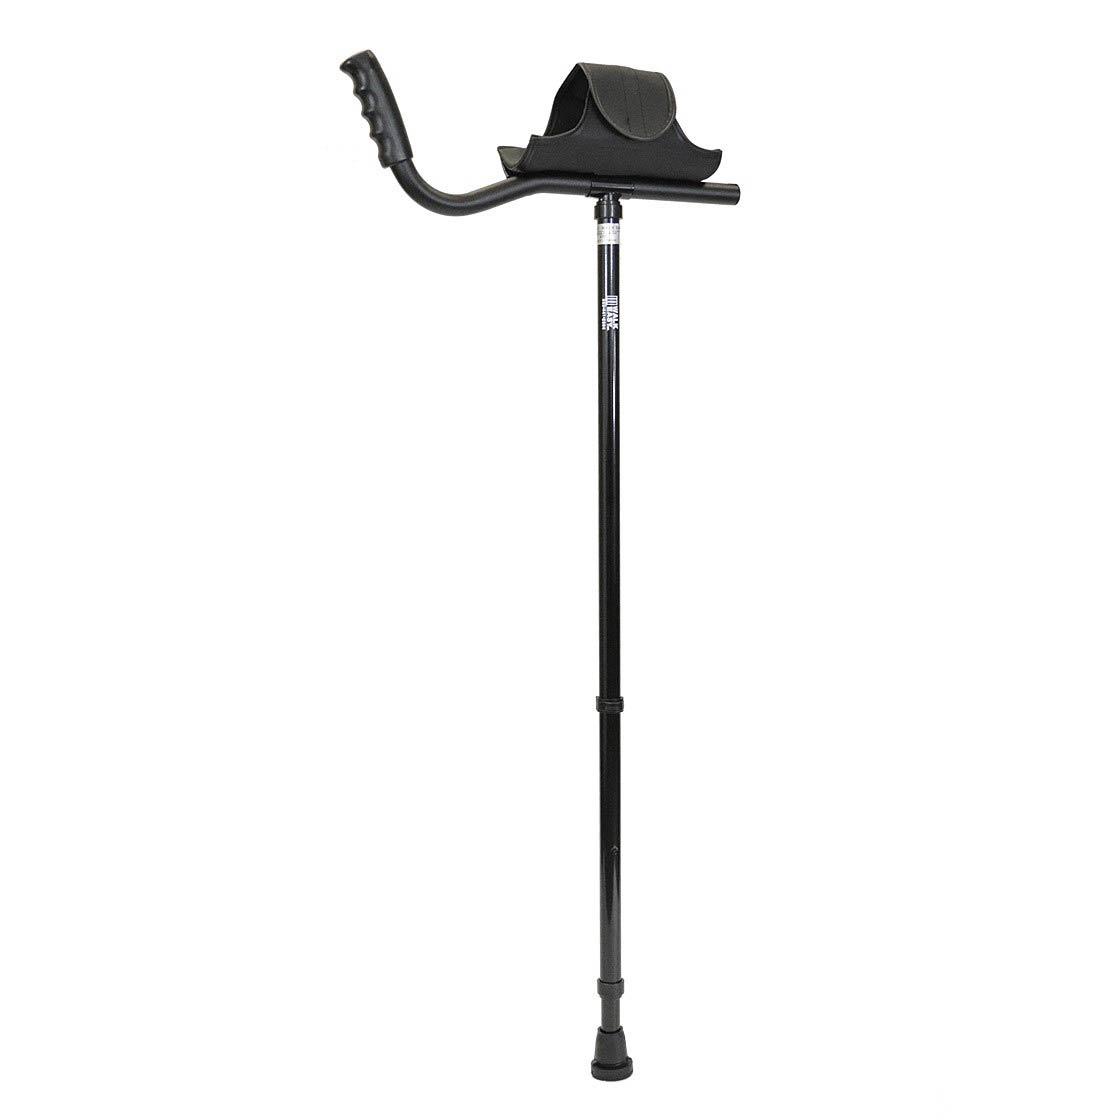 Walk Easy Adult Platform Crutch With Velcro Sleeve